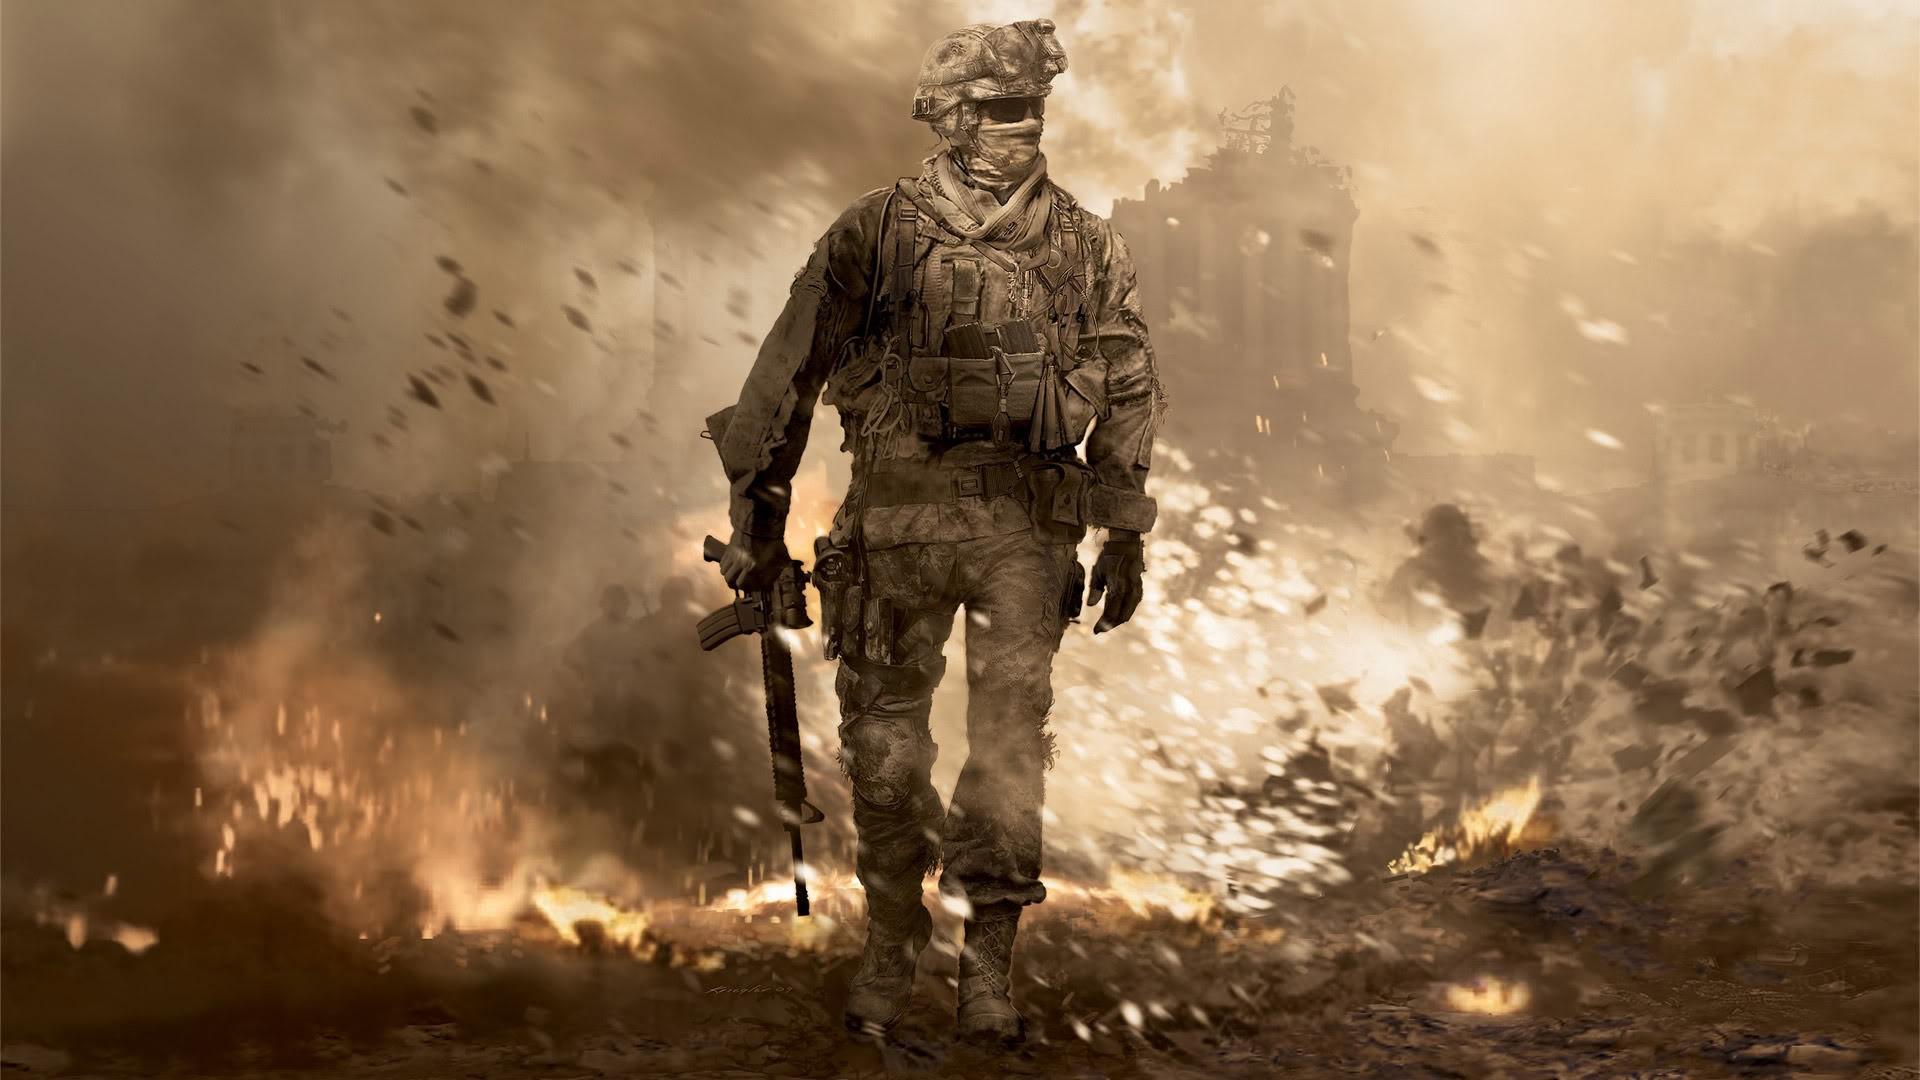 General 1920x1080 Call of Duty Call of Duty Modern Warfare 2 video games